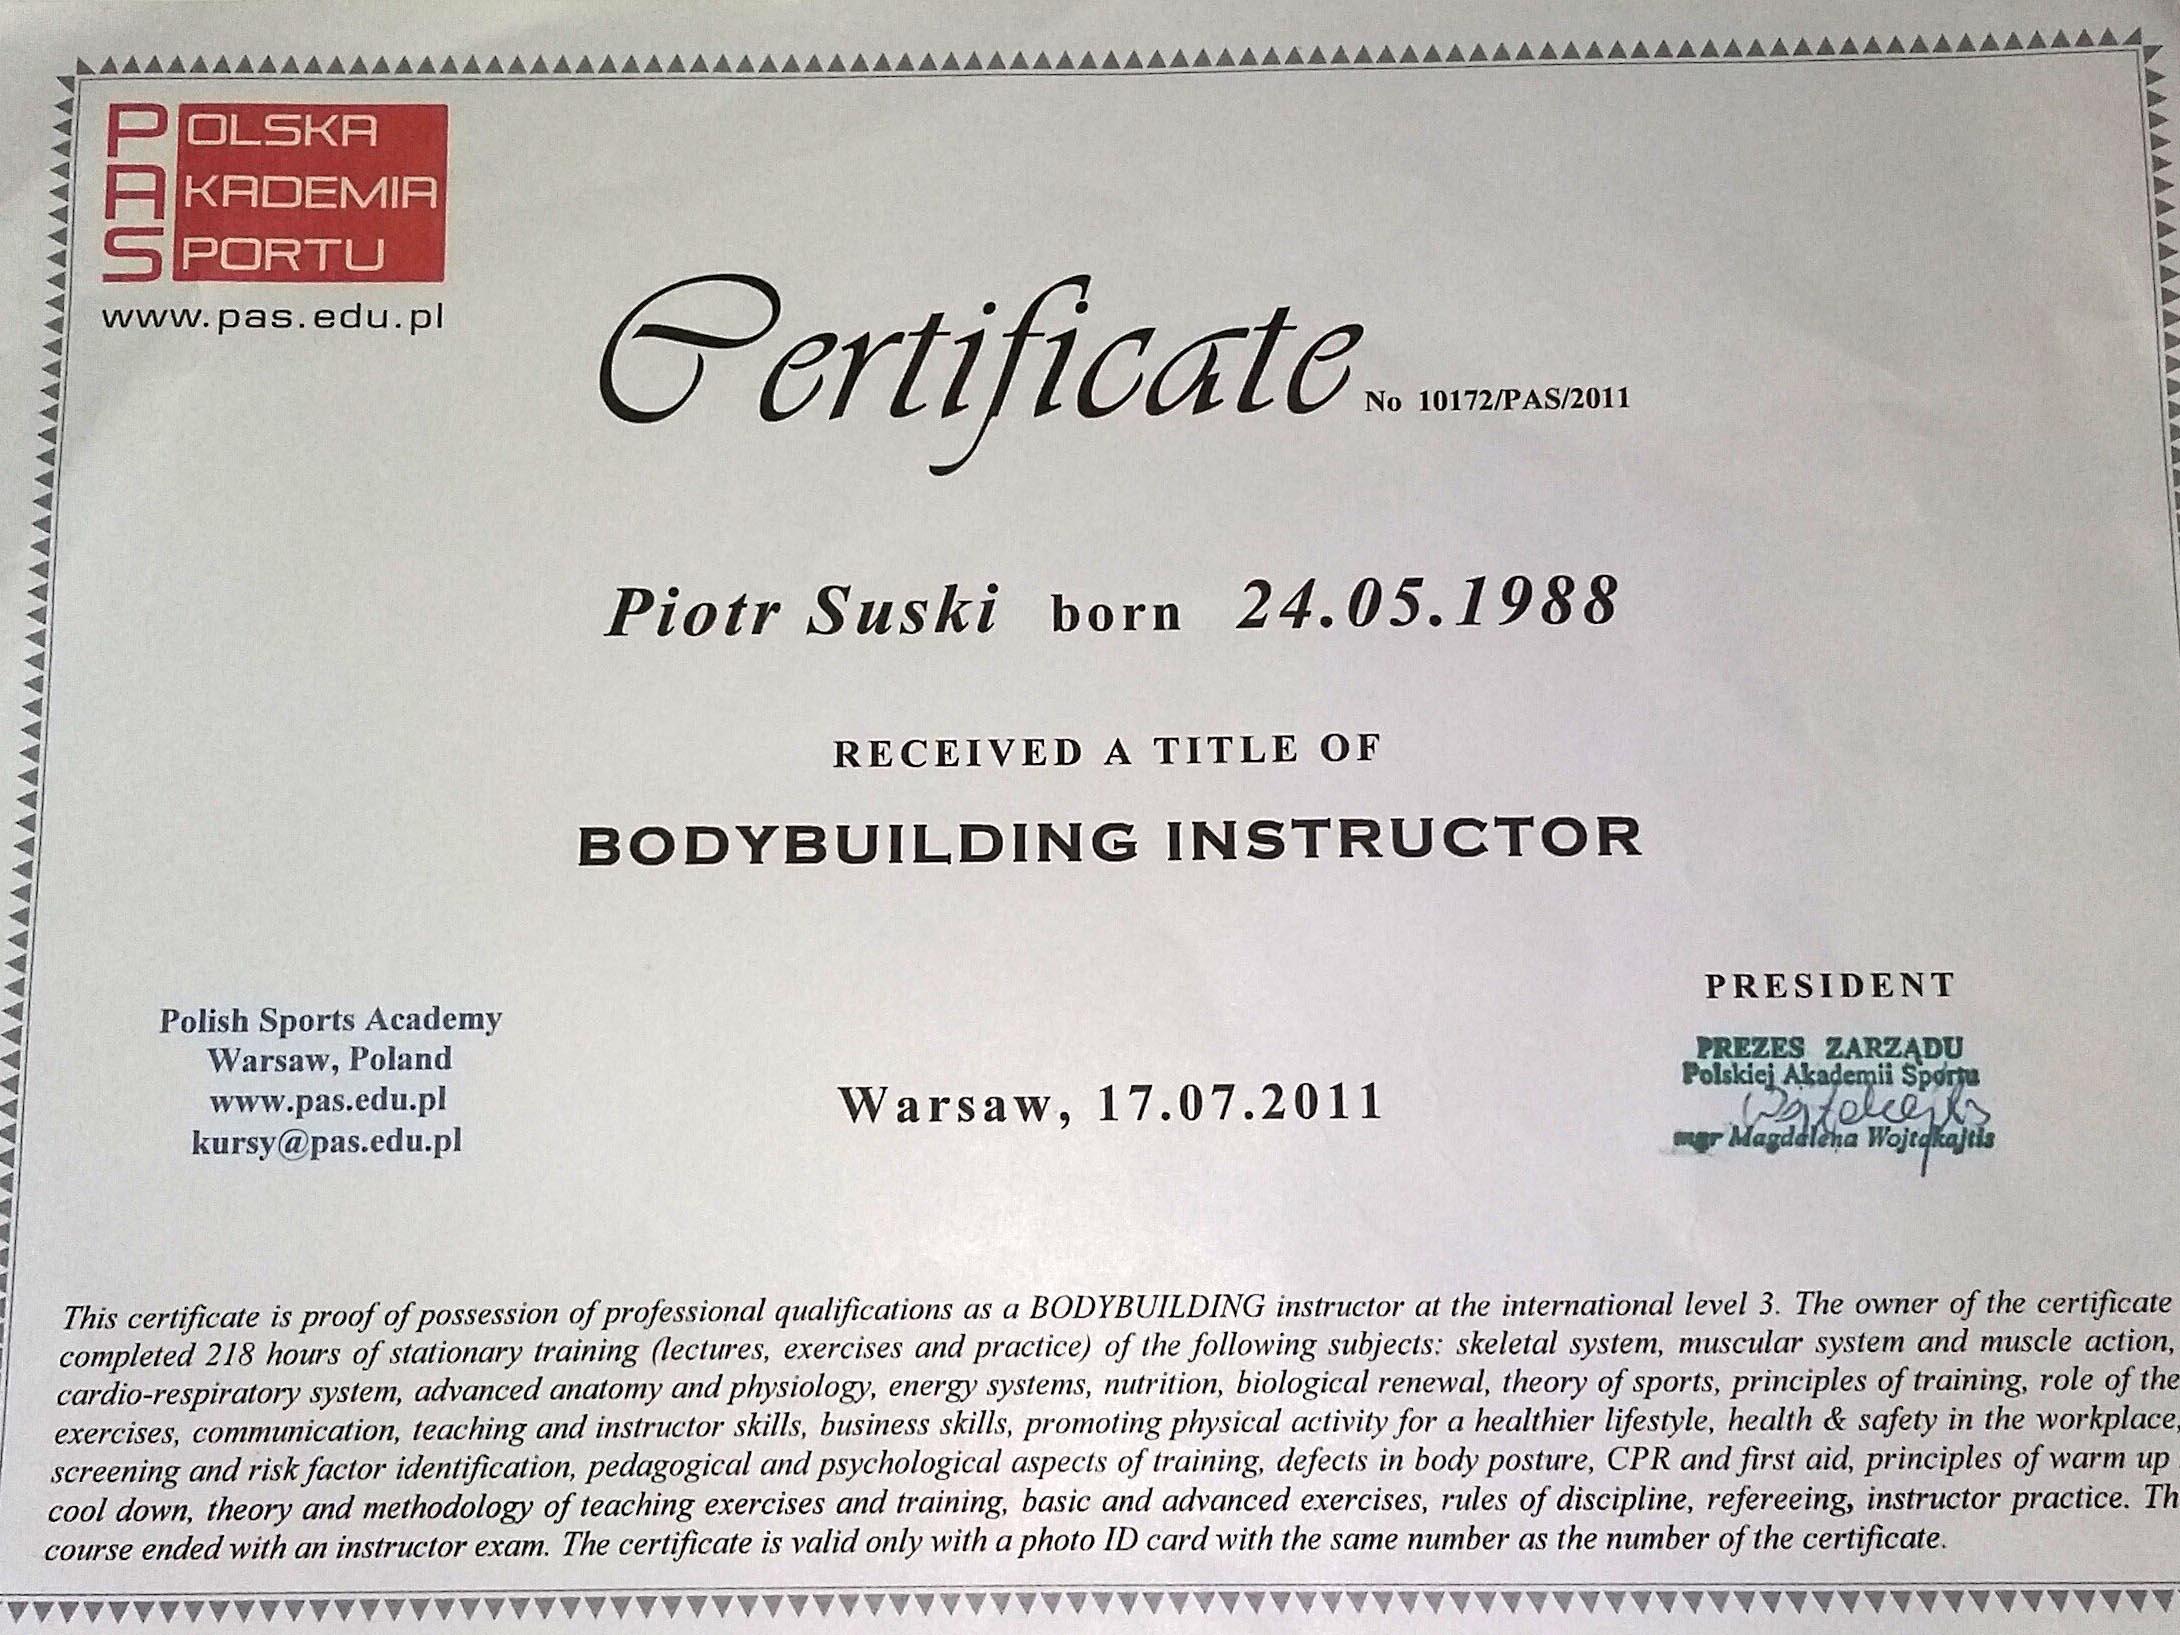 Piotr Suski certyfikat 2.jpg